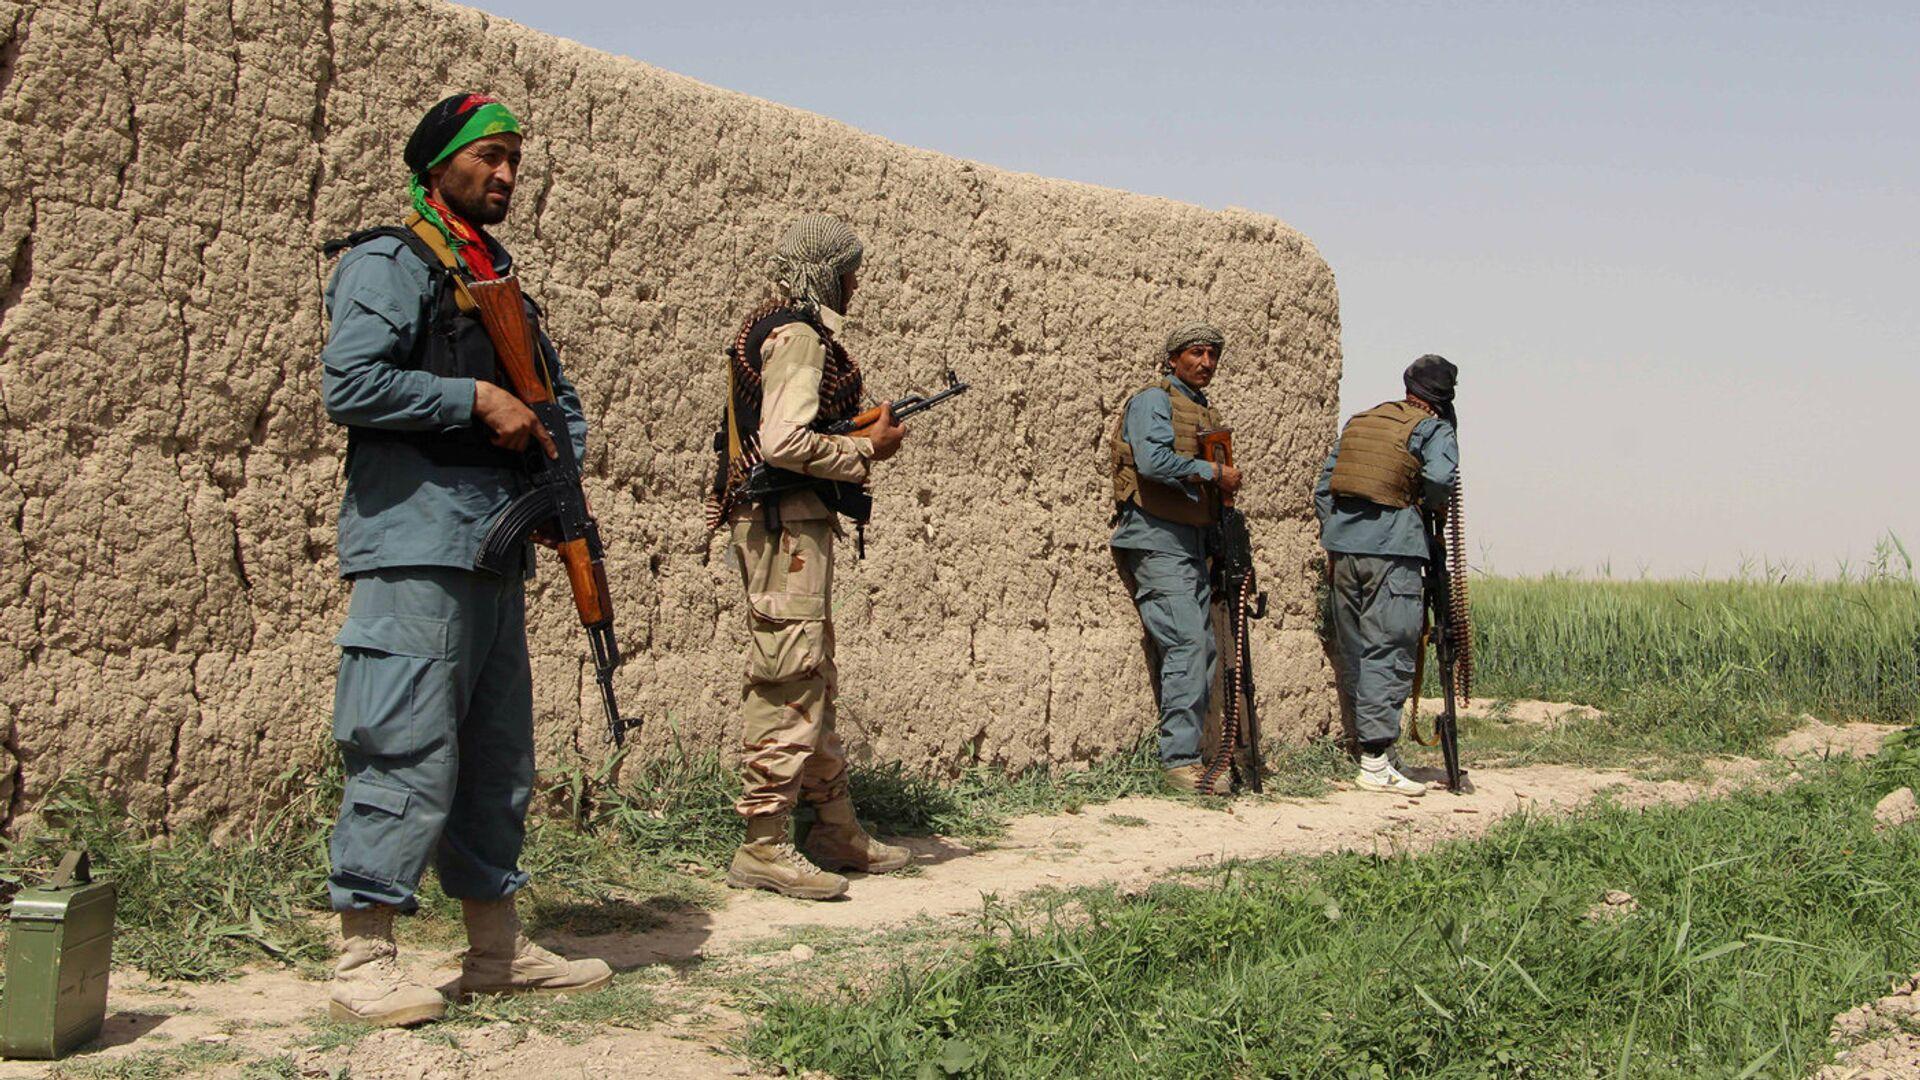 Полицейские Афганистана во время боя с талибами в Нахри-Сарадж провинции Гильменд, Афганистан - Sputnik Latvija, 1920, 01.08.2021